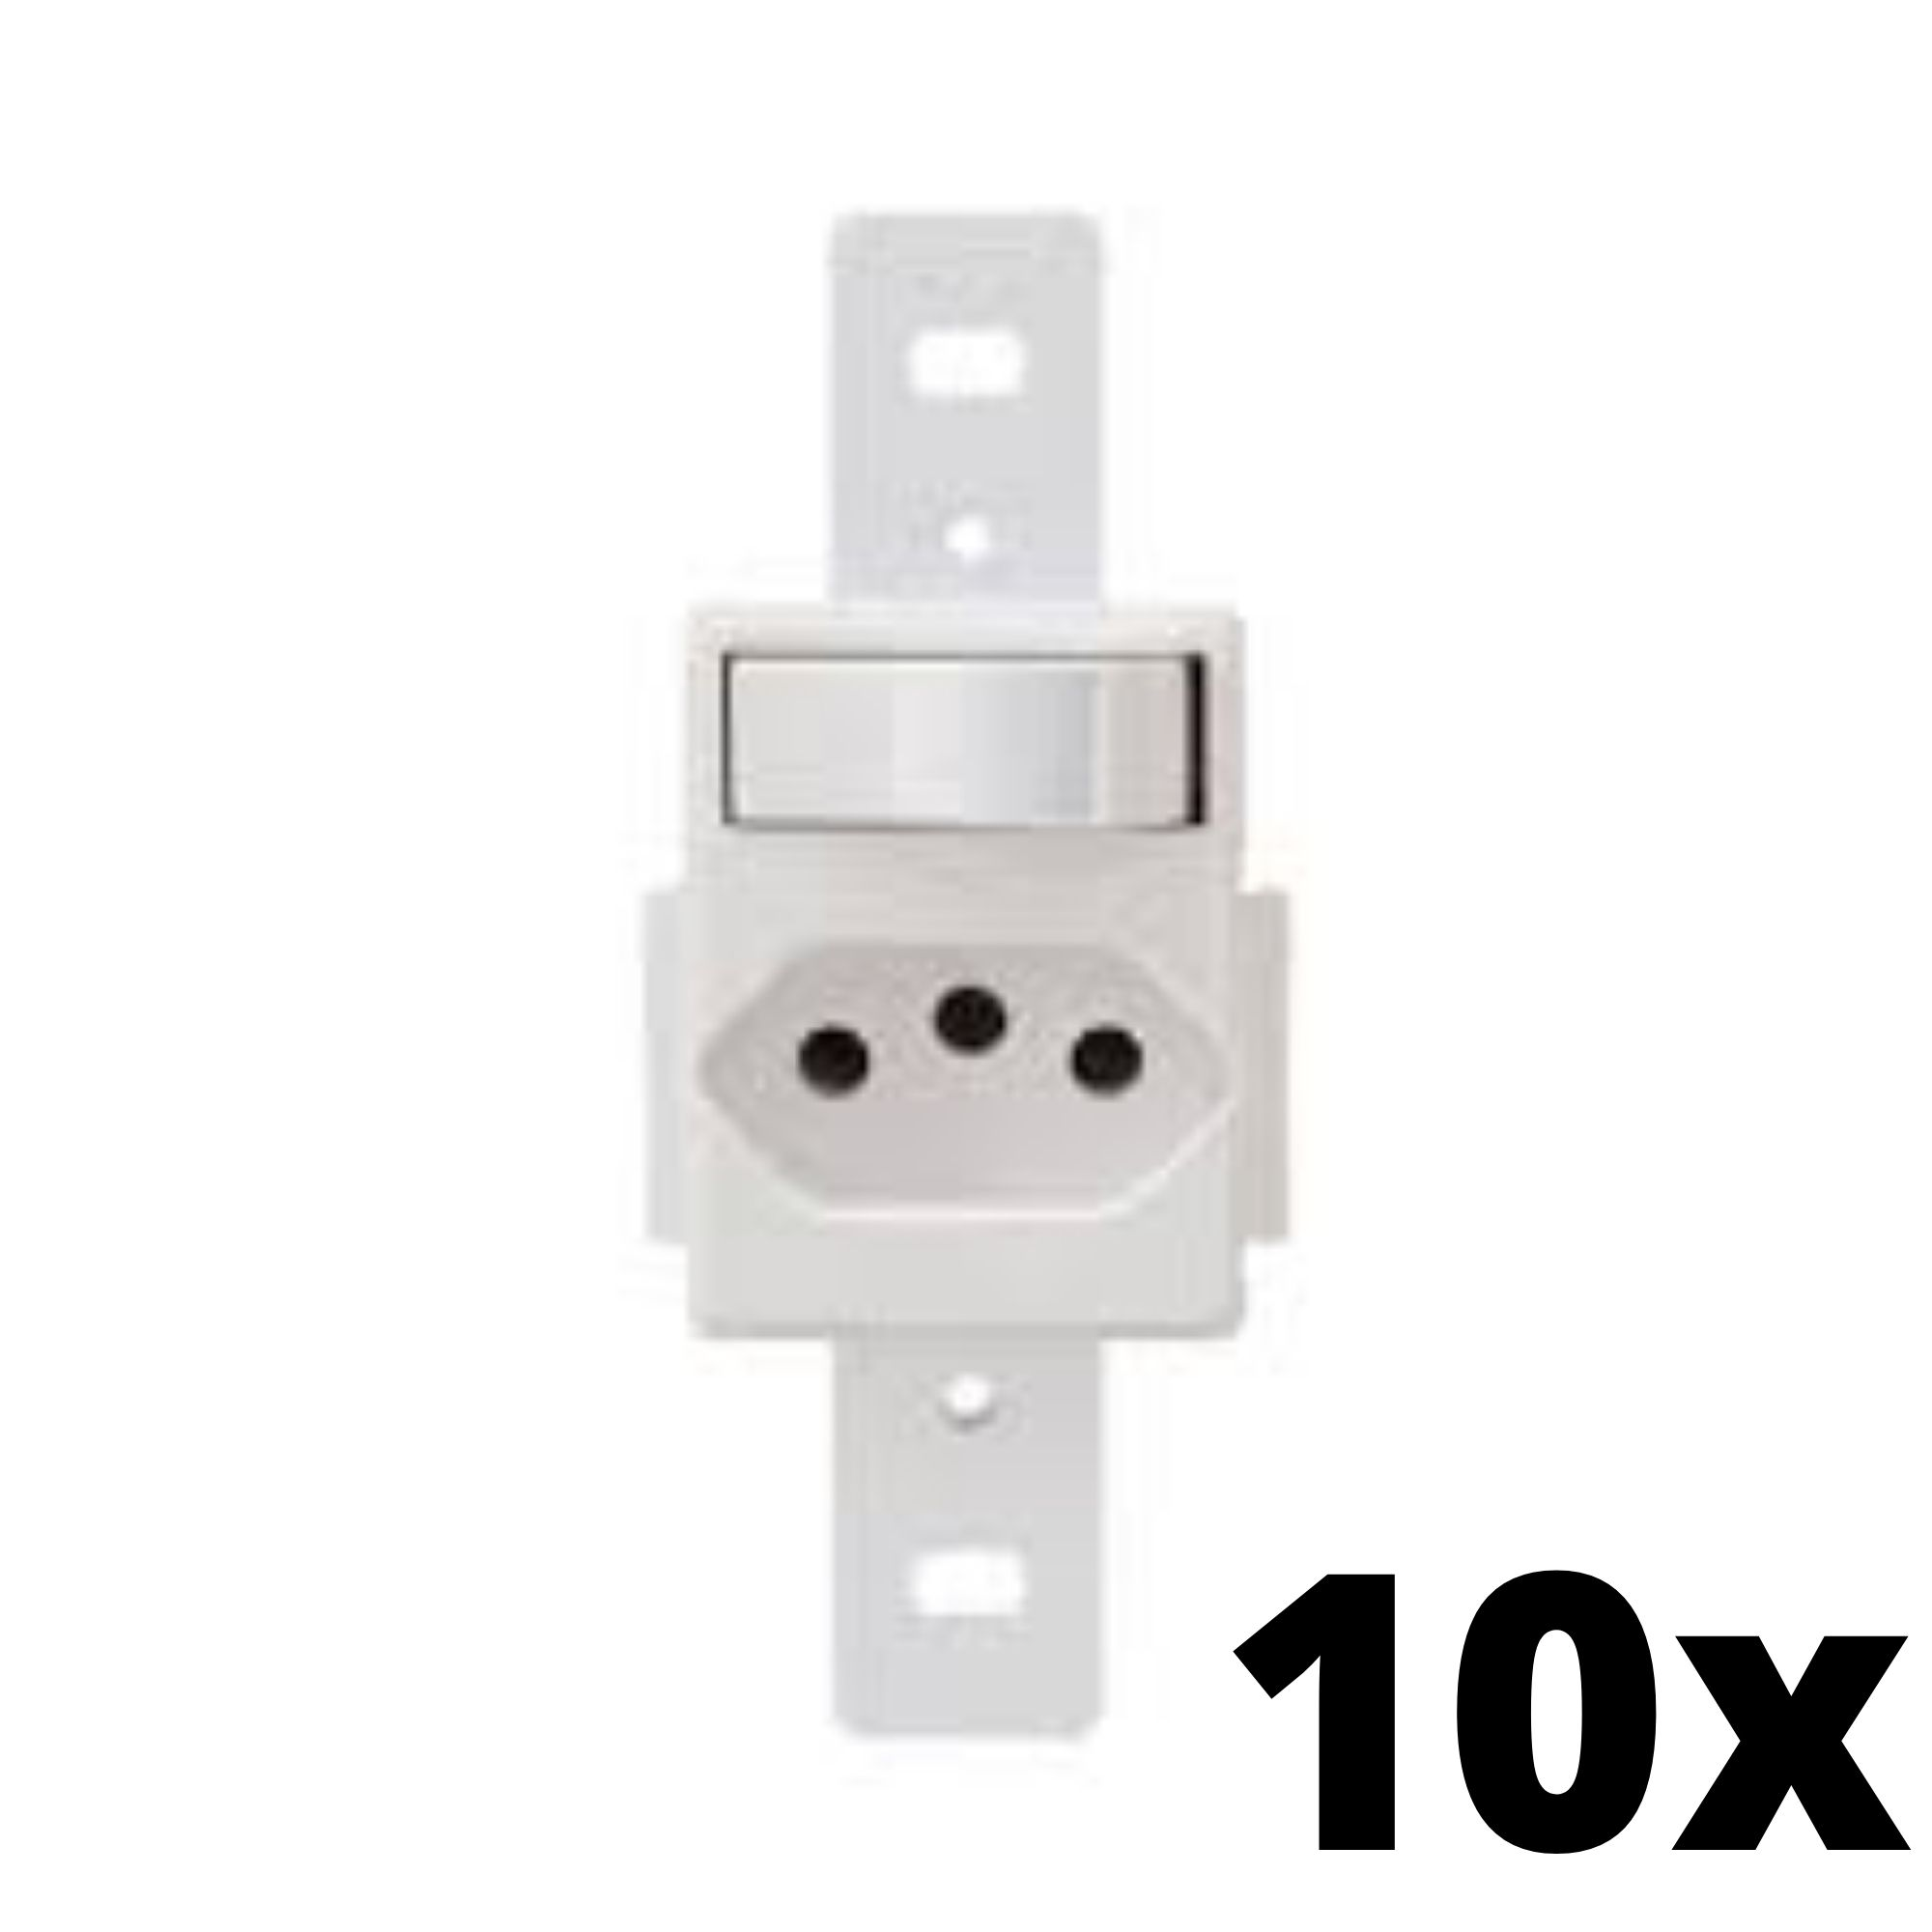 Kit 10 und Blanc 1Seção Interruptor Simples+1Seção Tomada 10A Sem Placa